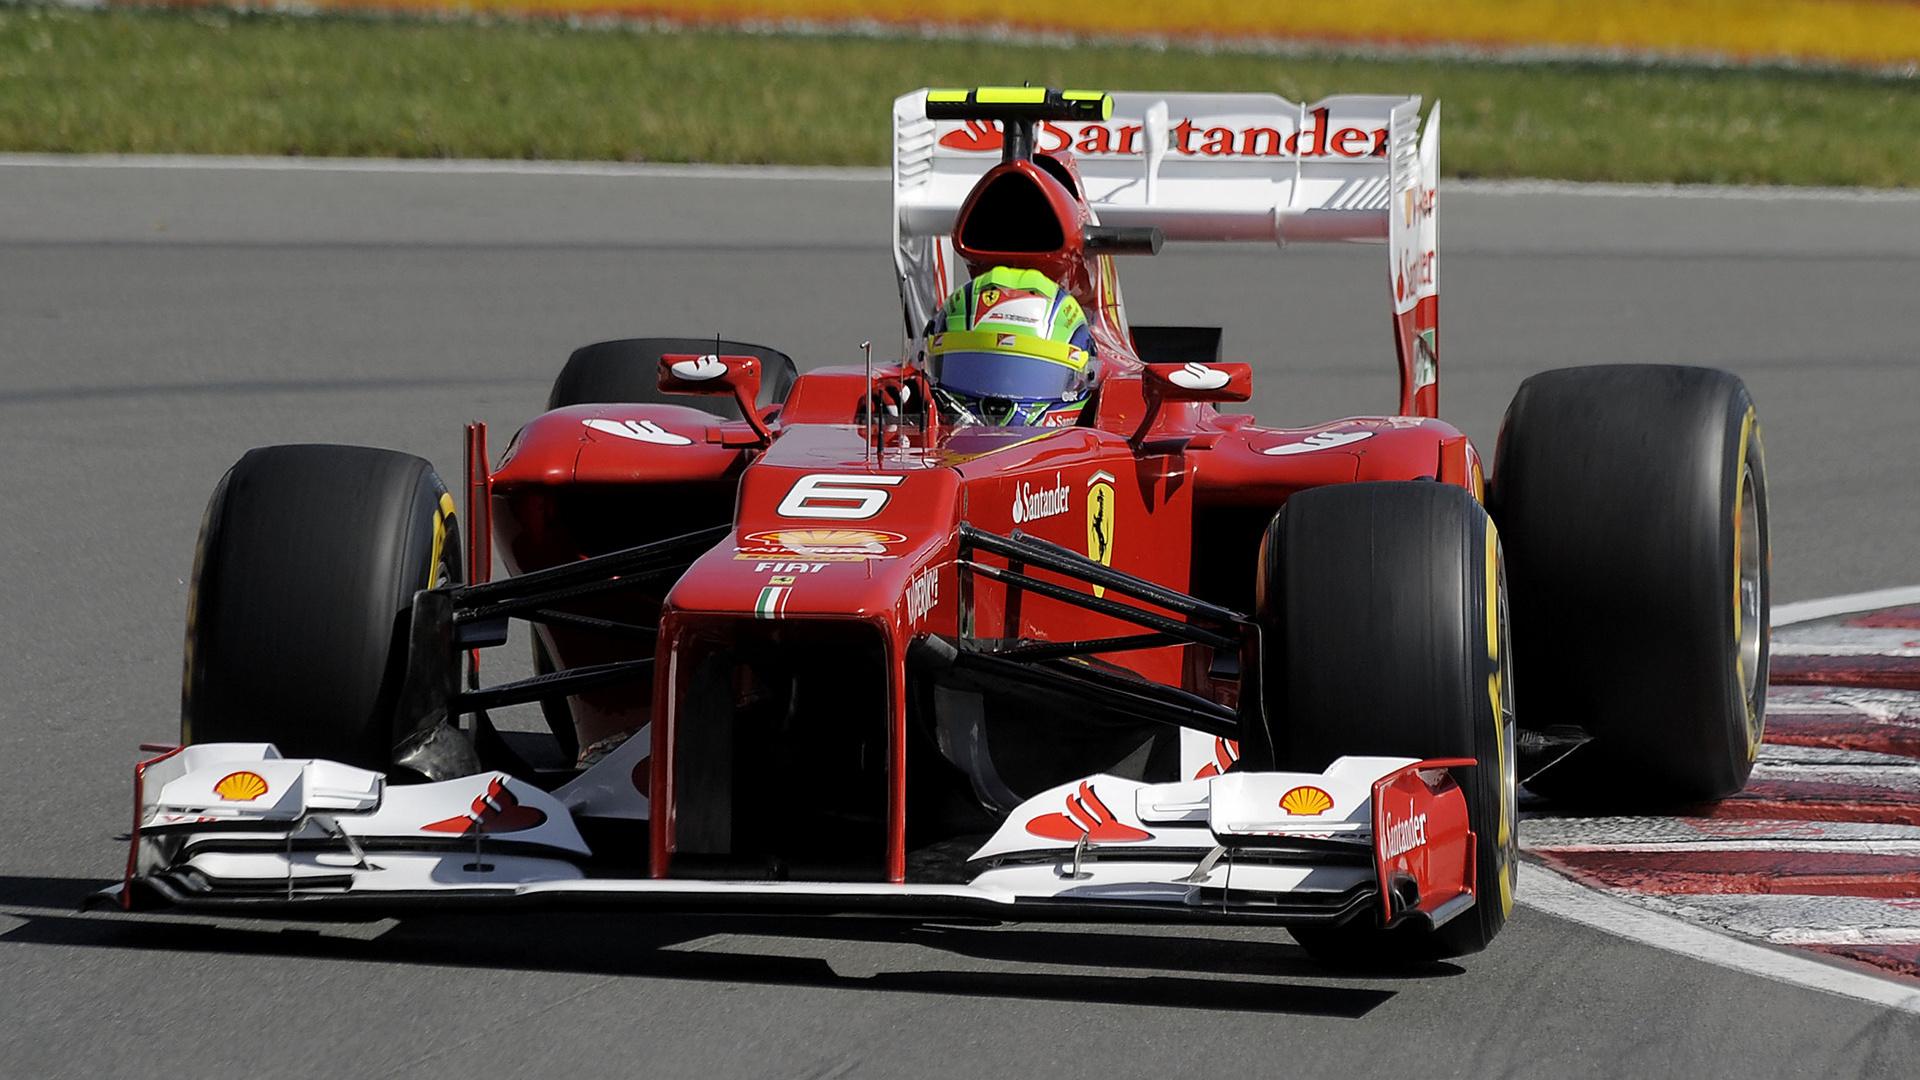 2012 Ferrari F2012 Hintergrundbilder Und Wallpaper In Hd Car Pixel